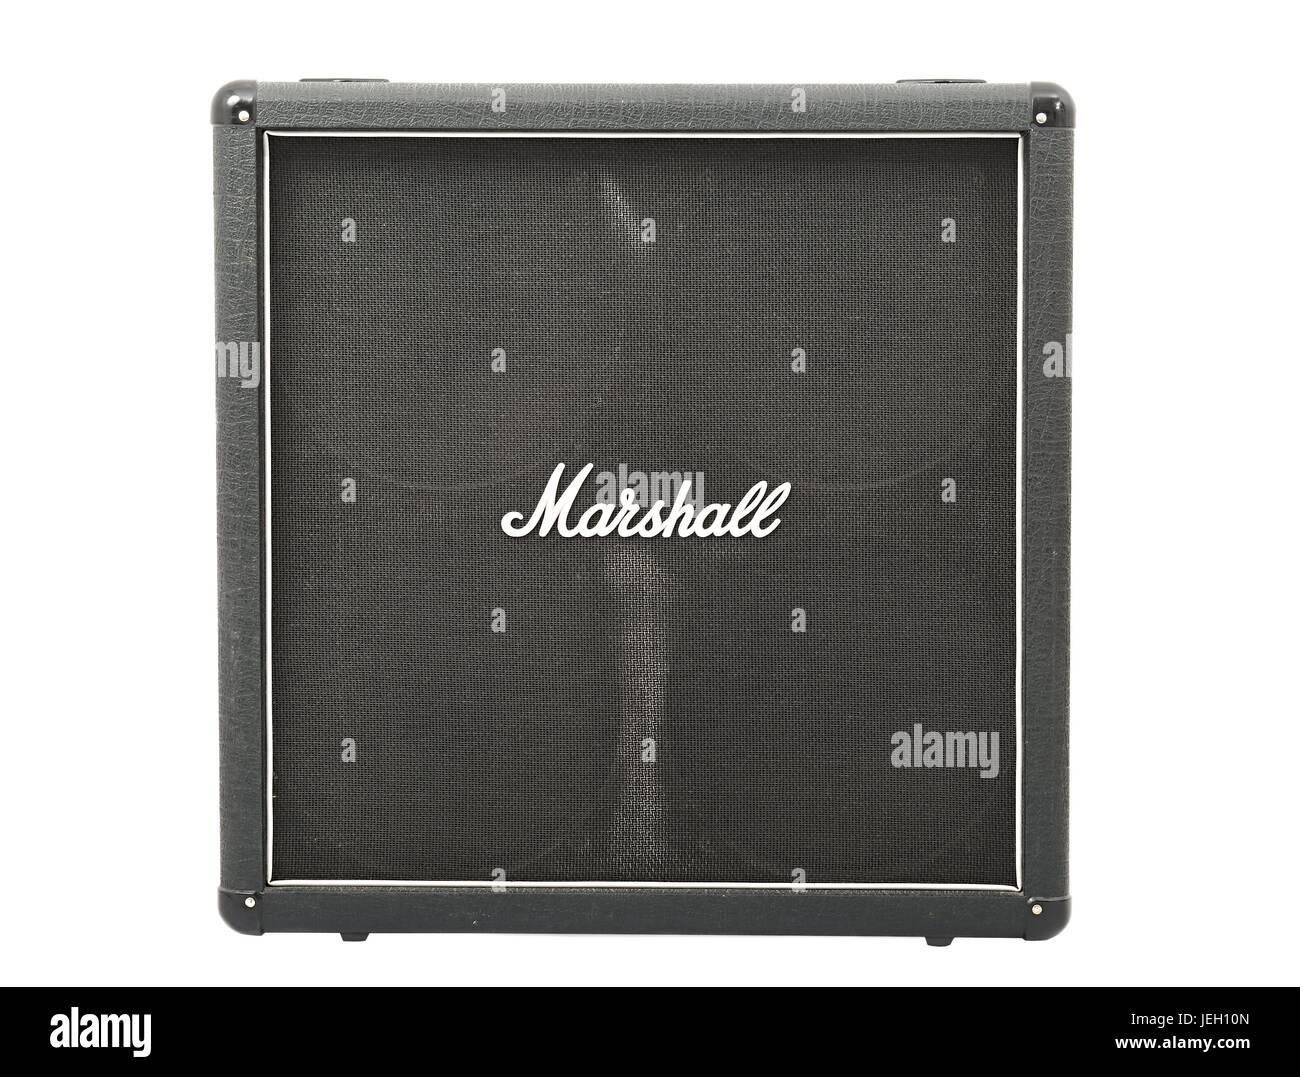 Marshall guitar cabinet - Stock Image